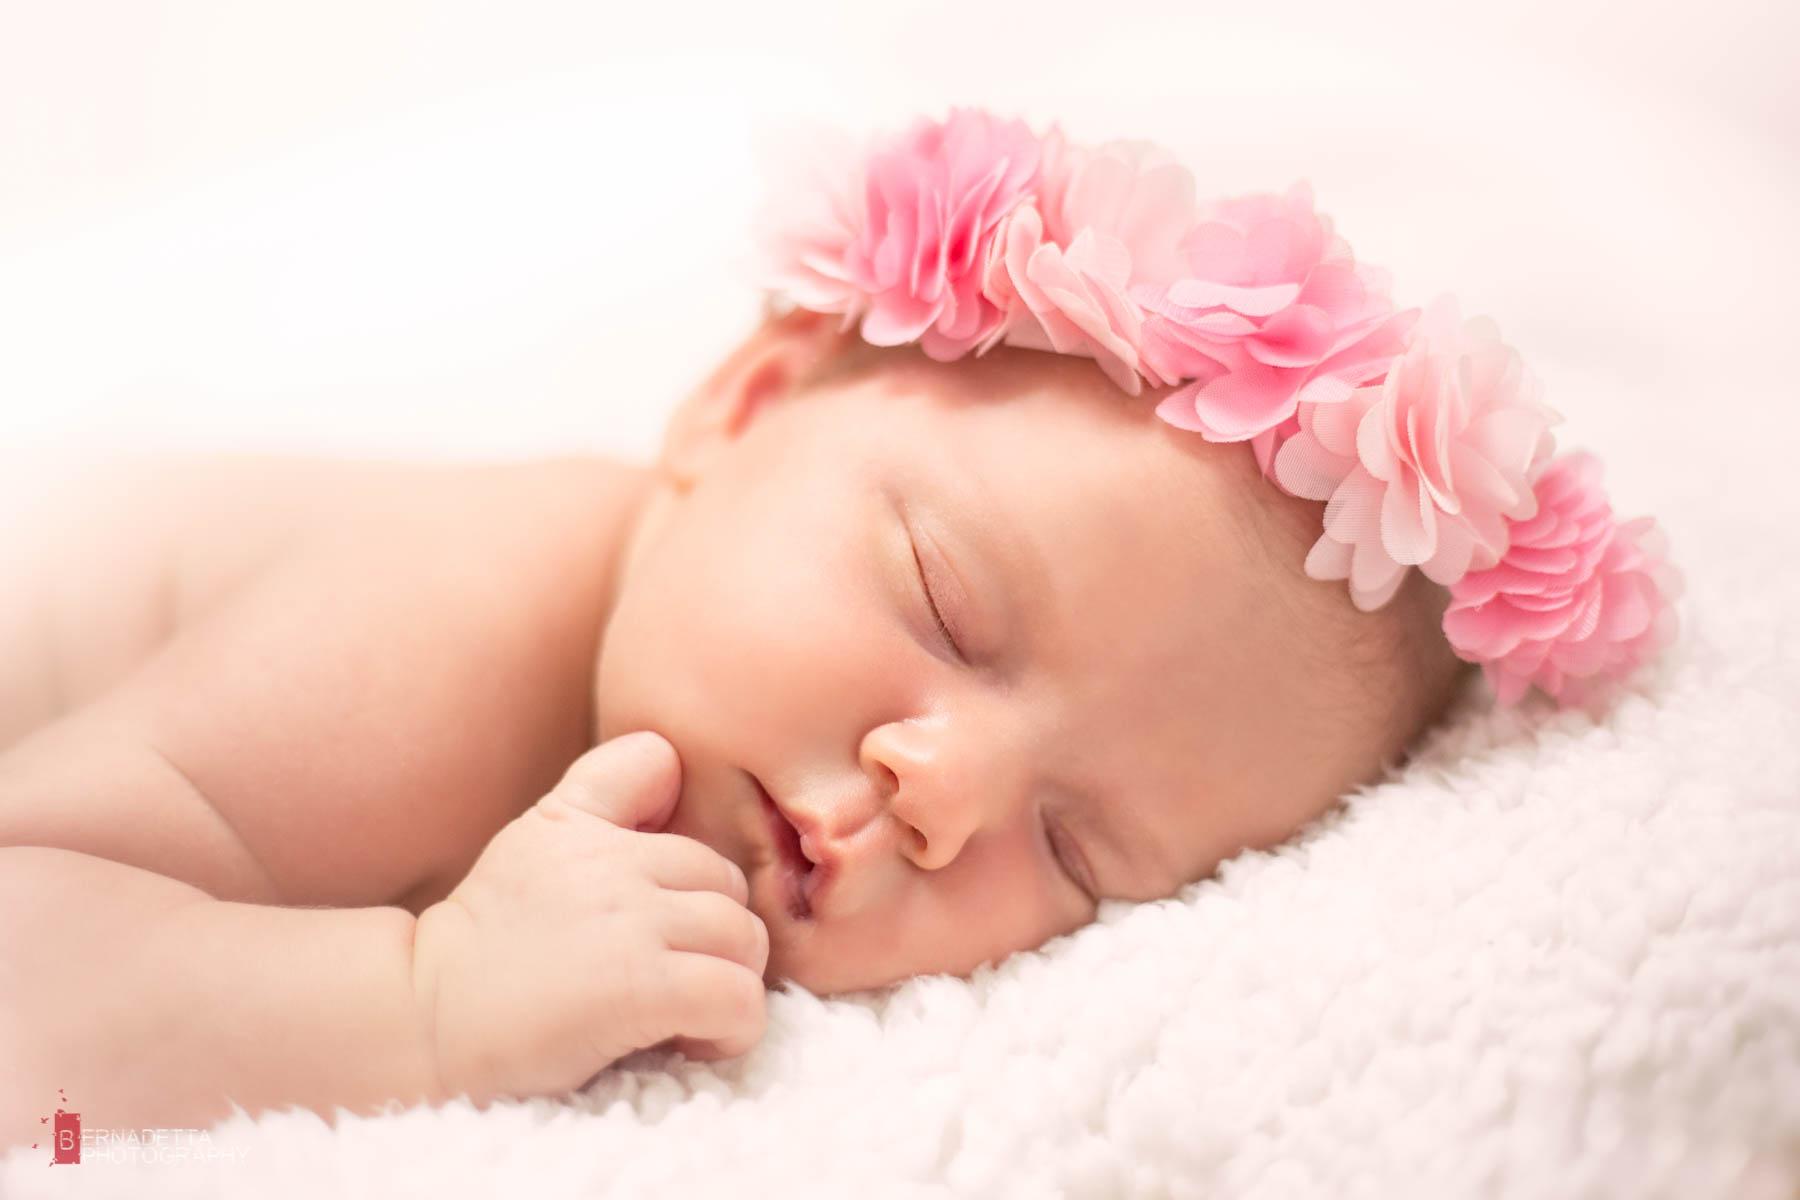 newborn-photography-sessions-chicago-1.jpg